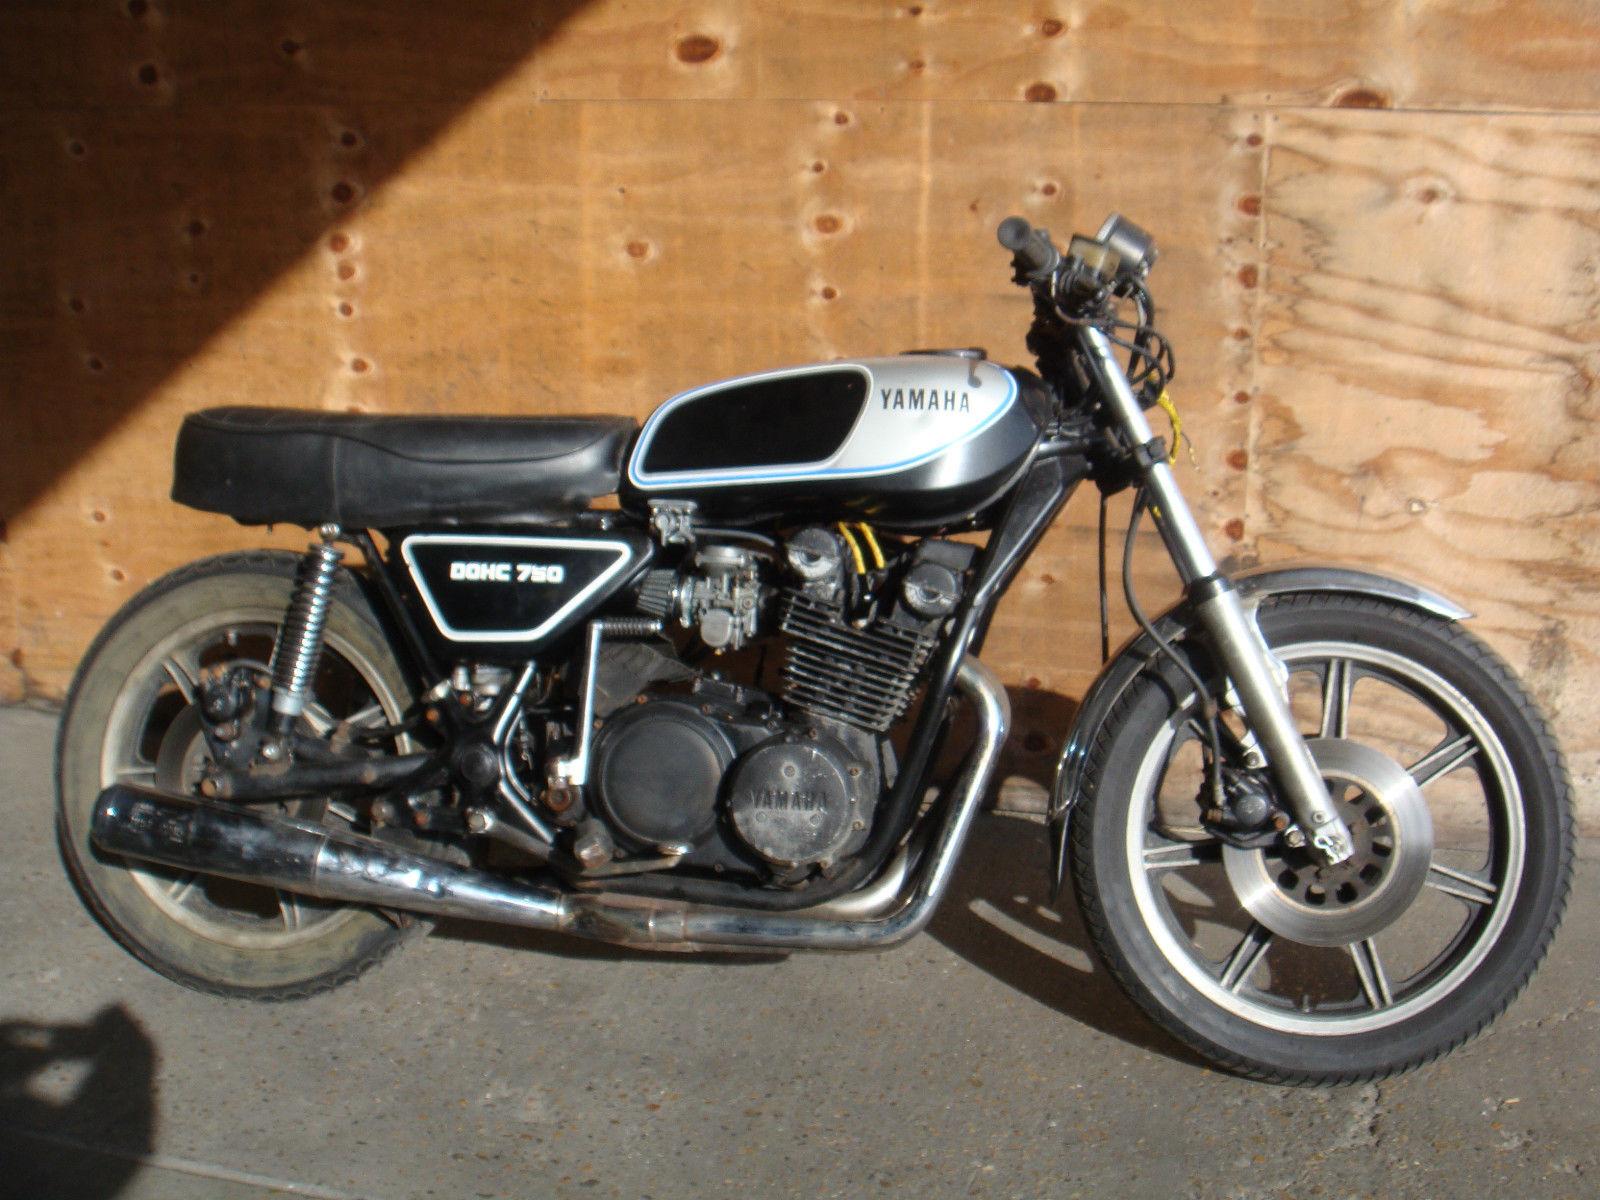 Yamaha XS750 / XS 750 Triple - Cafe Racer Project - MOT'd Spares or Repair